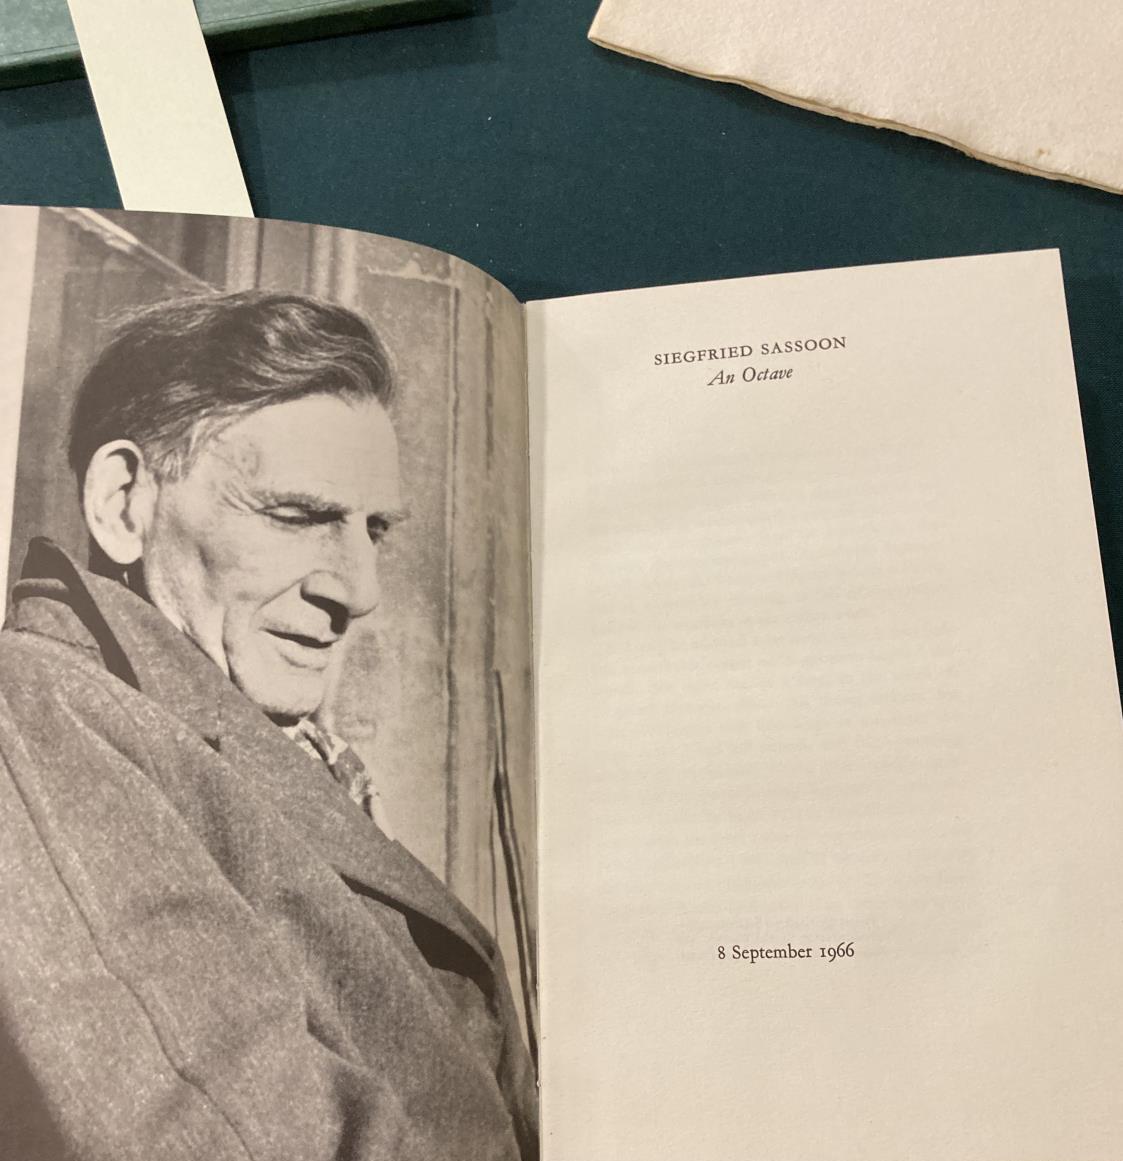 Sassoon, Siegfried. An Octave, number 107 of 350 copies, portrait frontispiece, original green